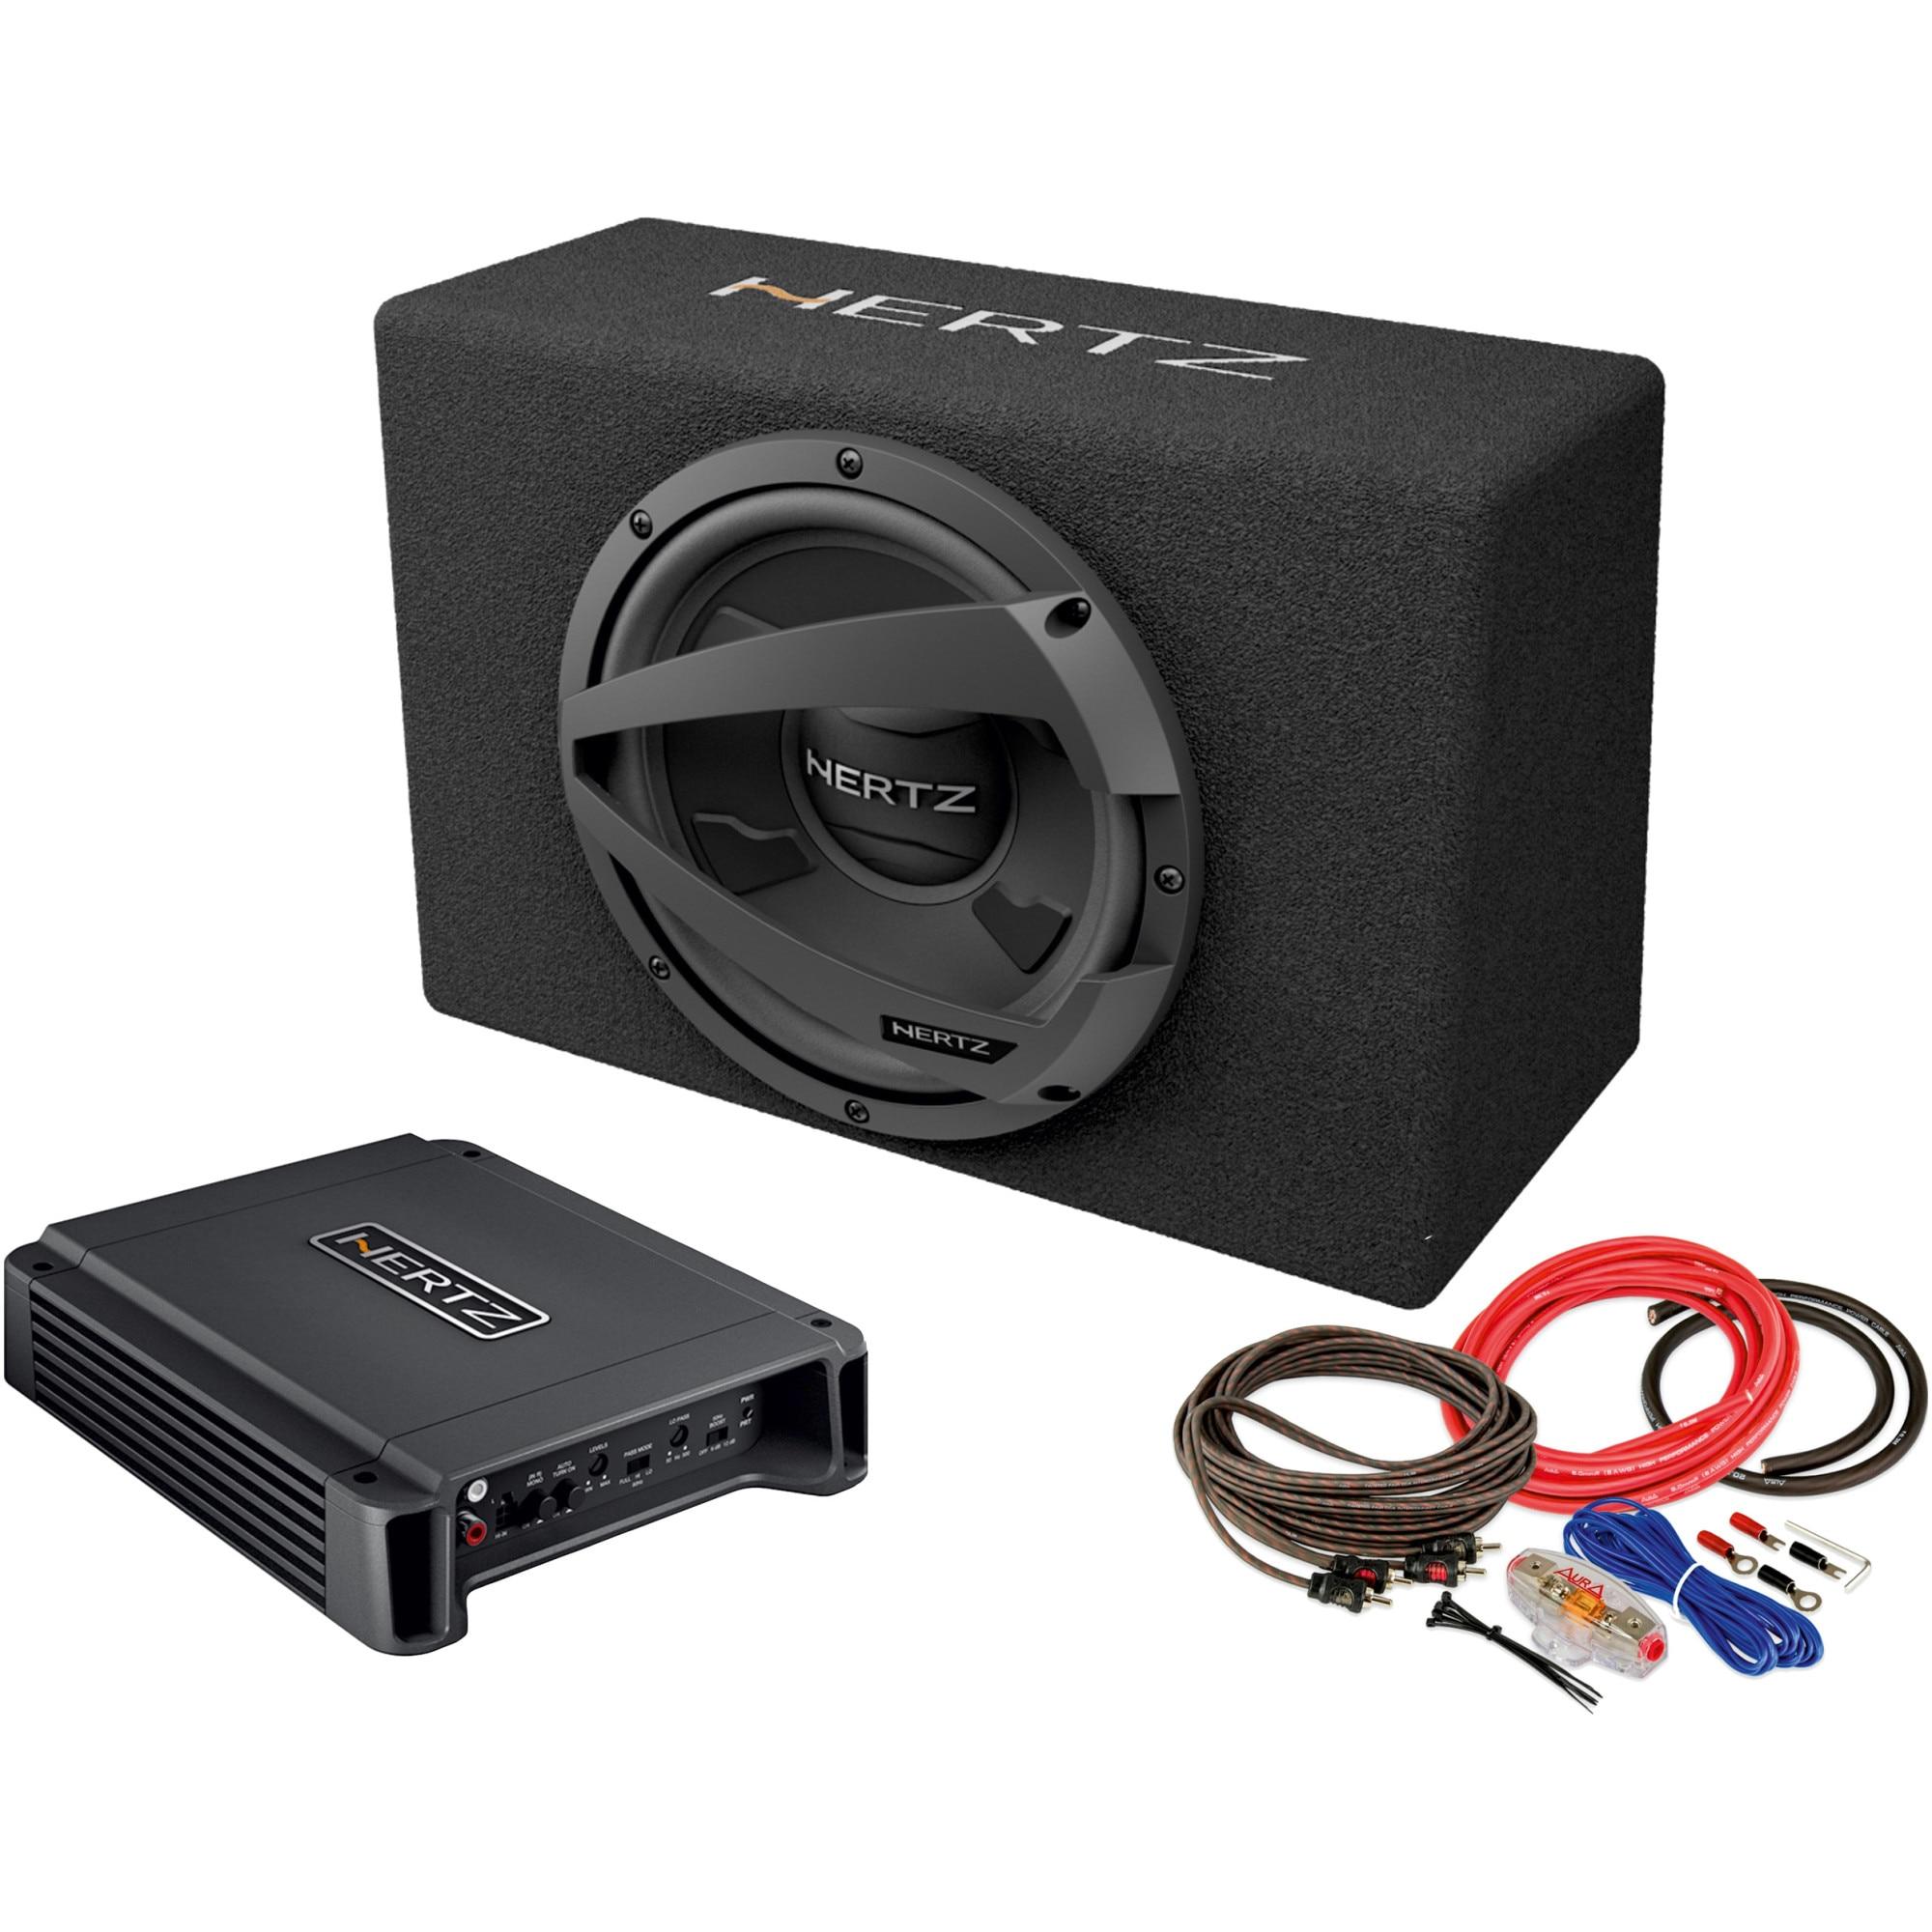 Fotografie Pachet Subwoofer auto Hertz DBX 30.3 + Amplificator Hertz HCP 2 + Kit de cabluri complet